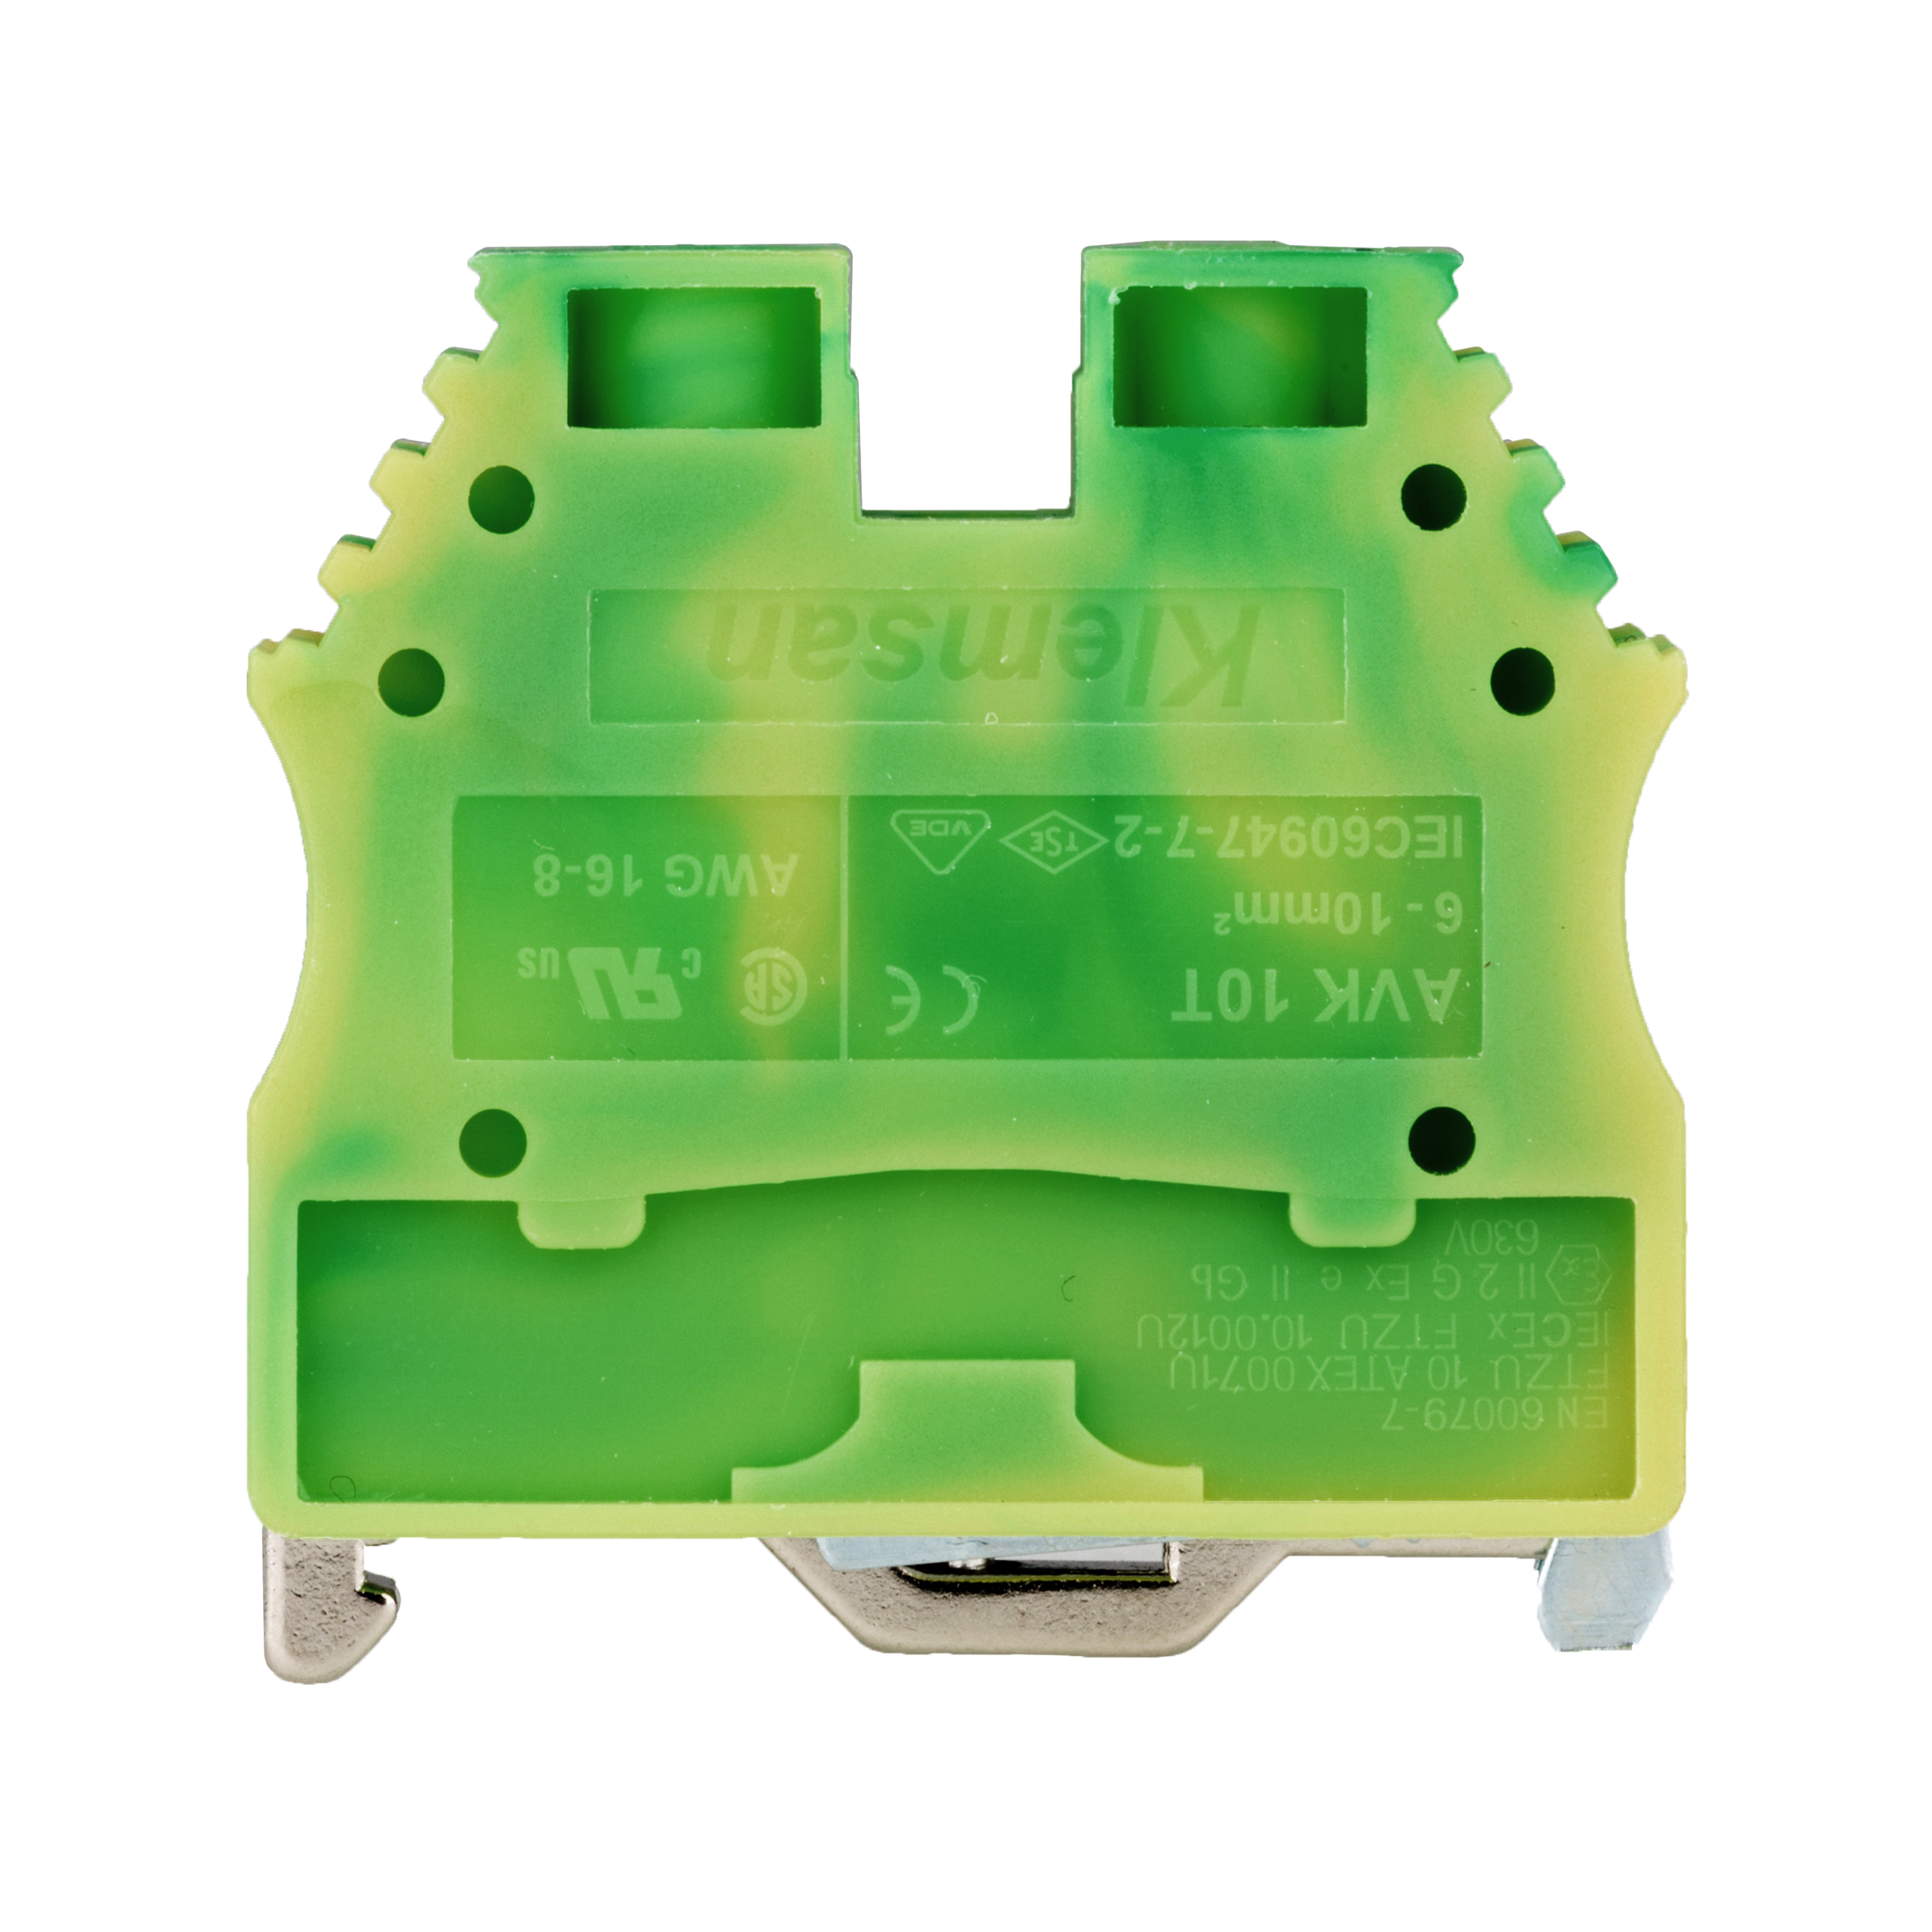 1 Stk Schutzleiterklemme 6-10mm², Type AVK 6/10 T IK622010--